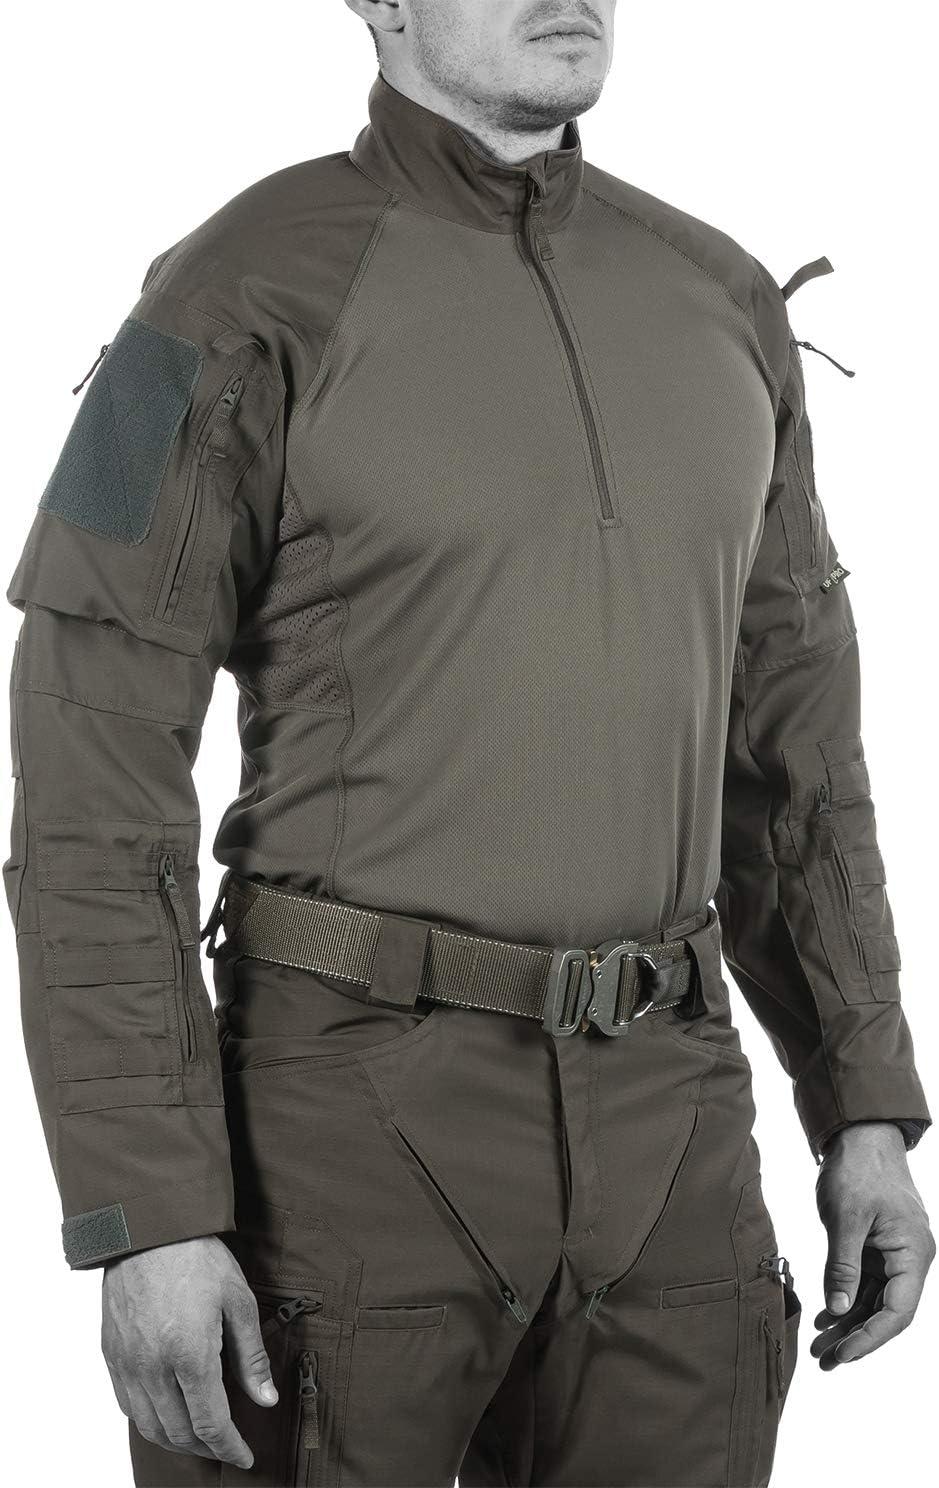 Camiseta de Combate Striker XT de UF Pro, Gen. 2 (talla M, color verde oliva)